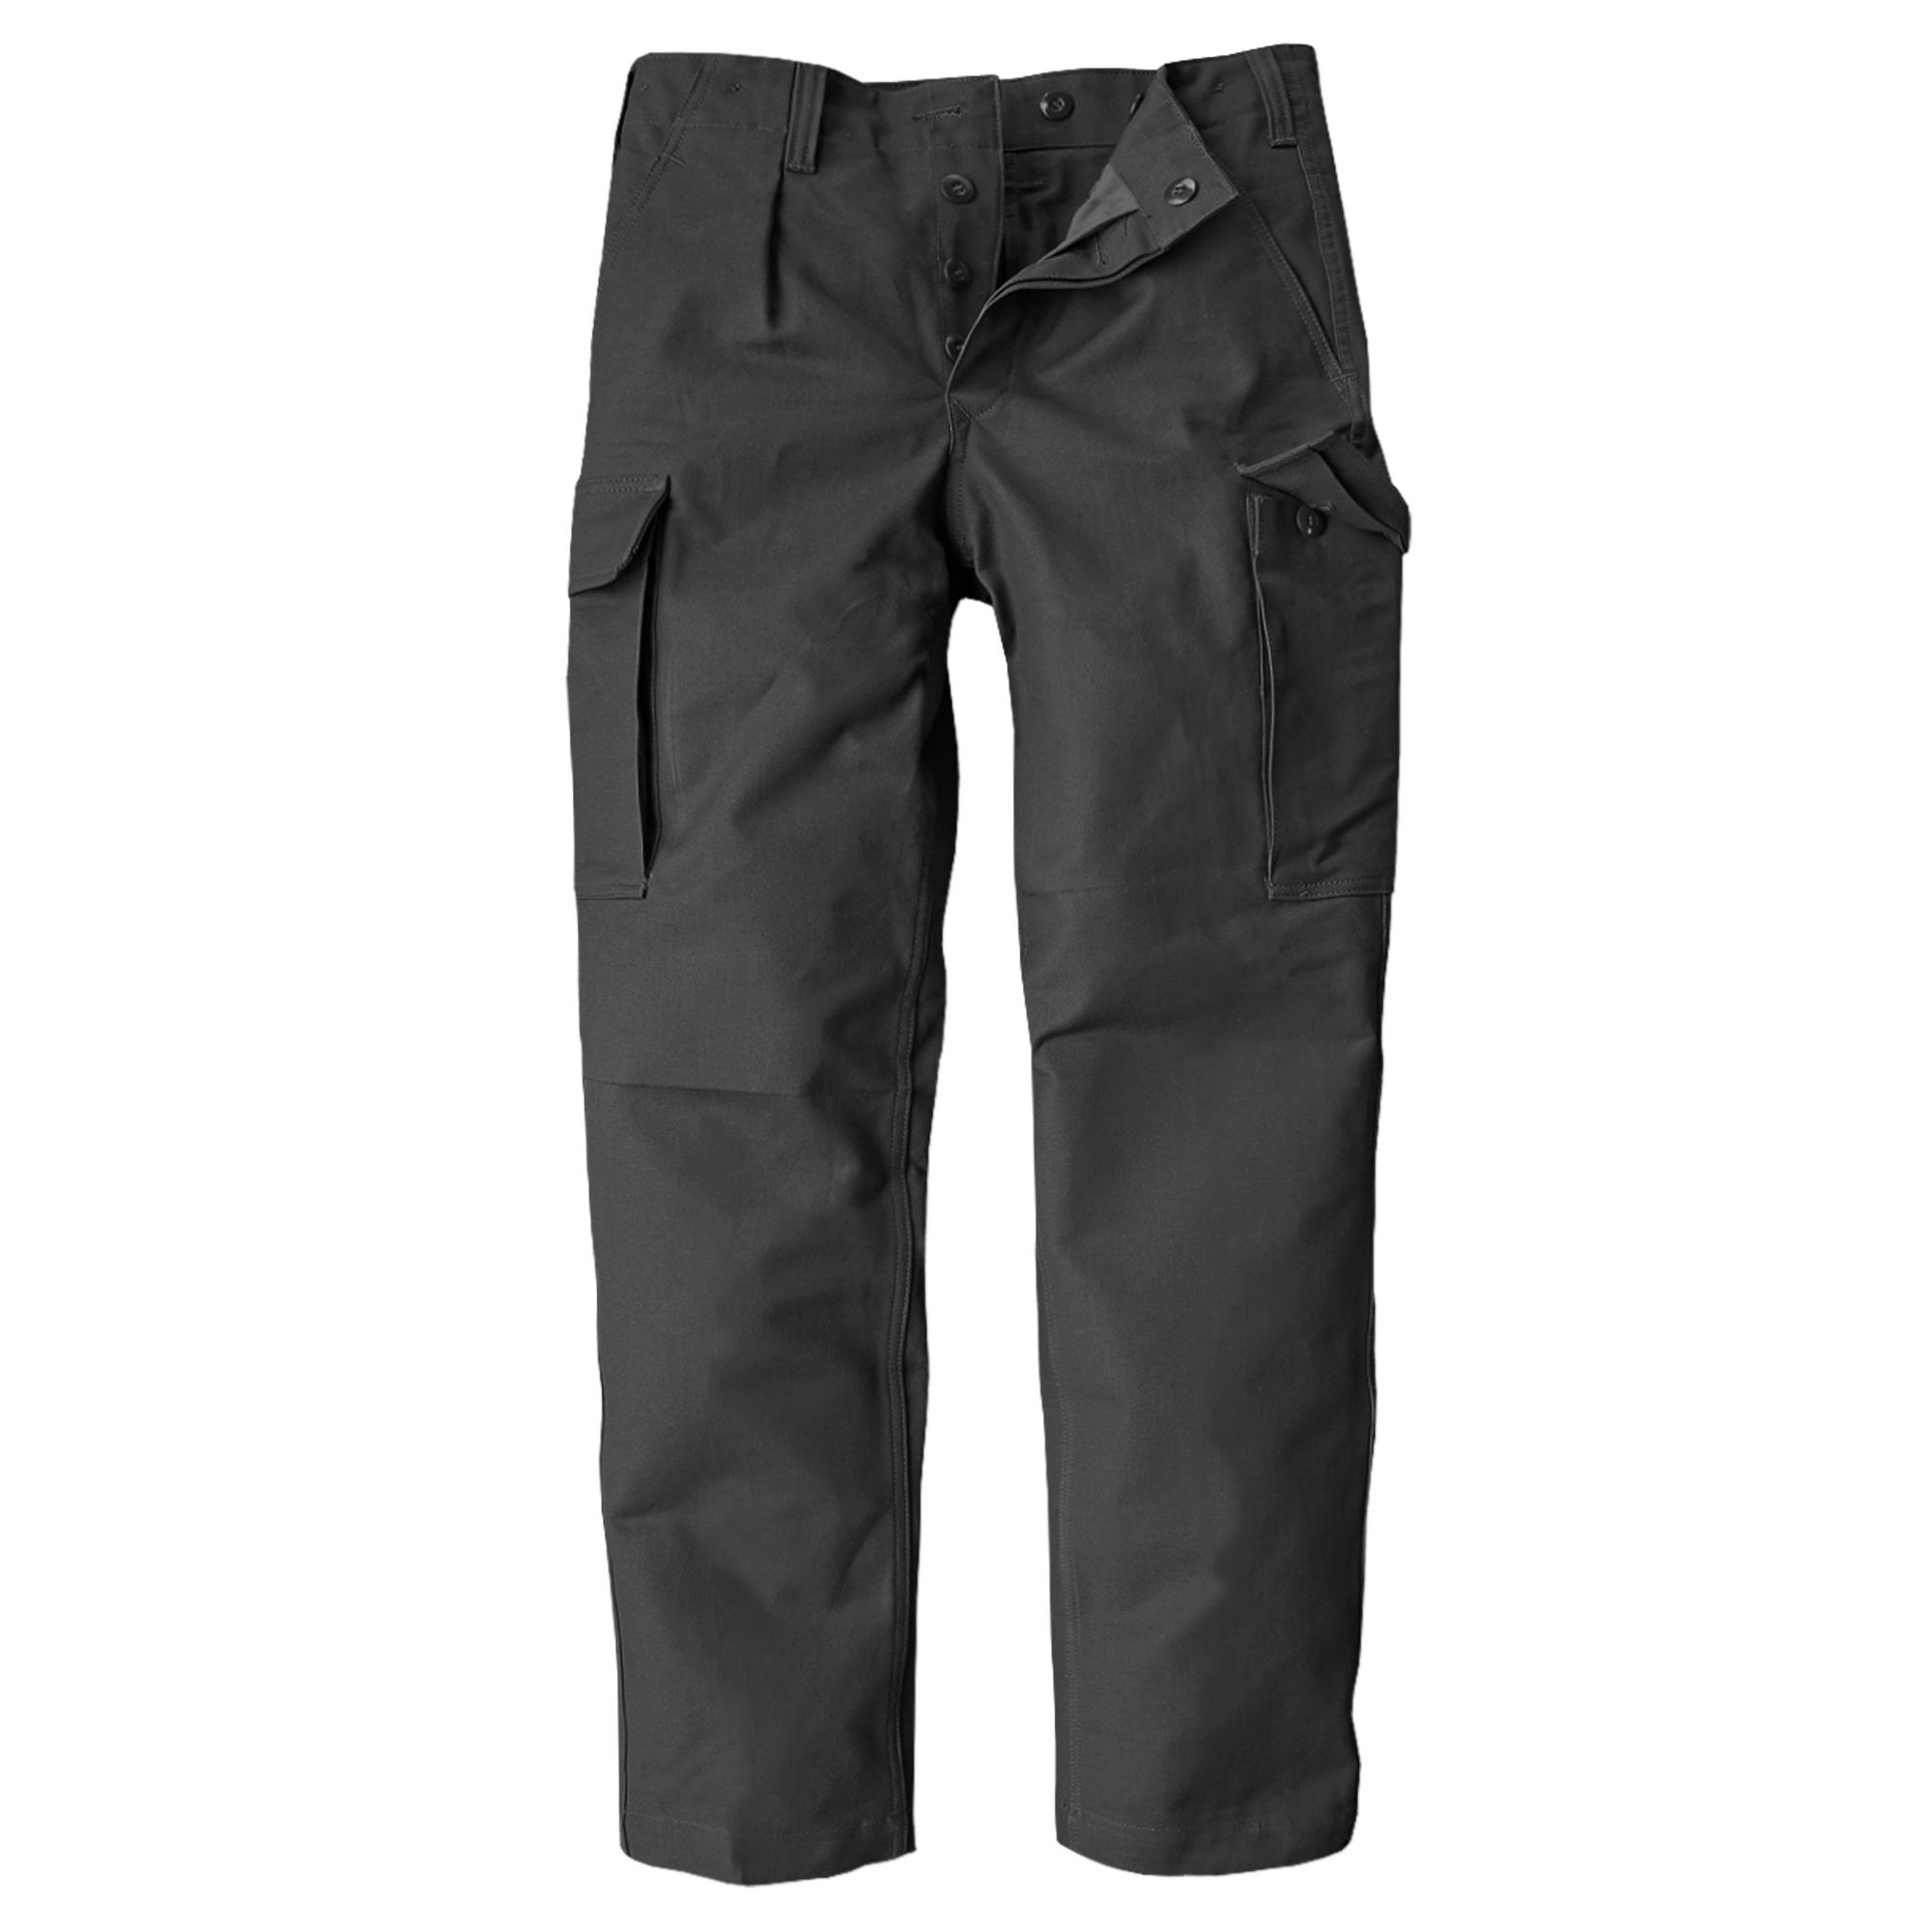 Pantalon moleskine BW Brandit Original TL noir